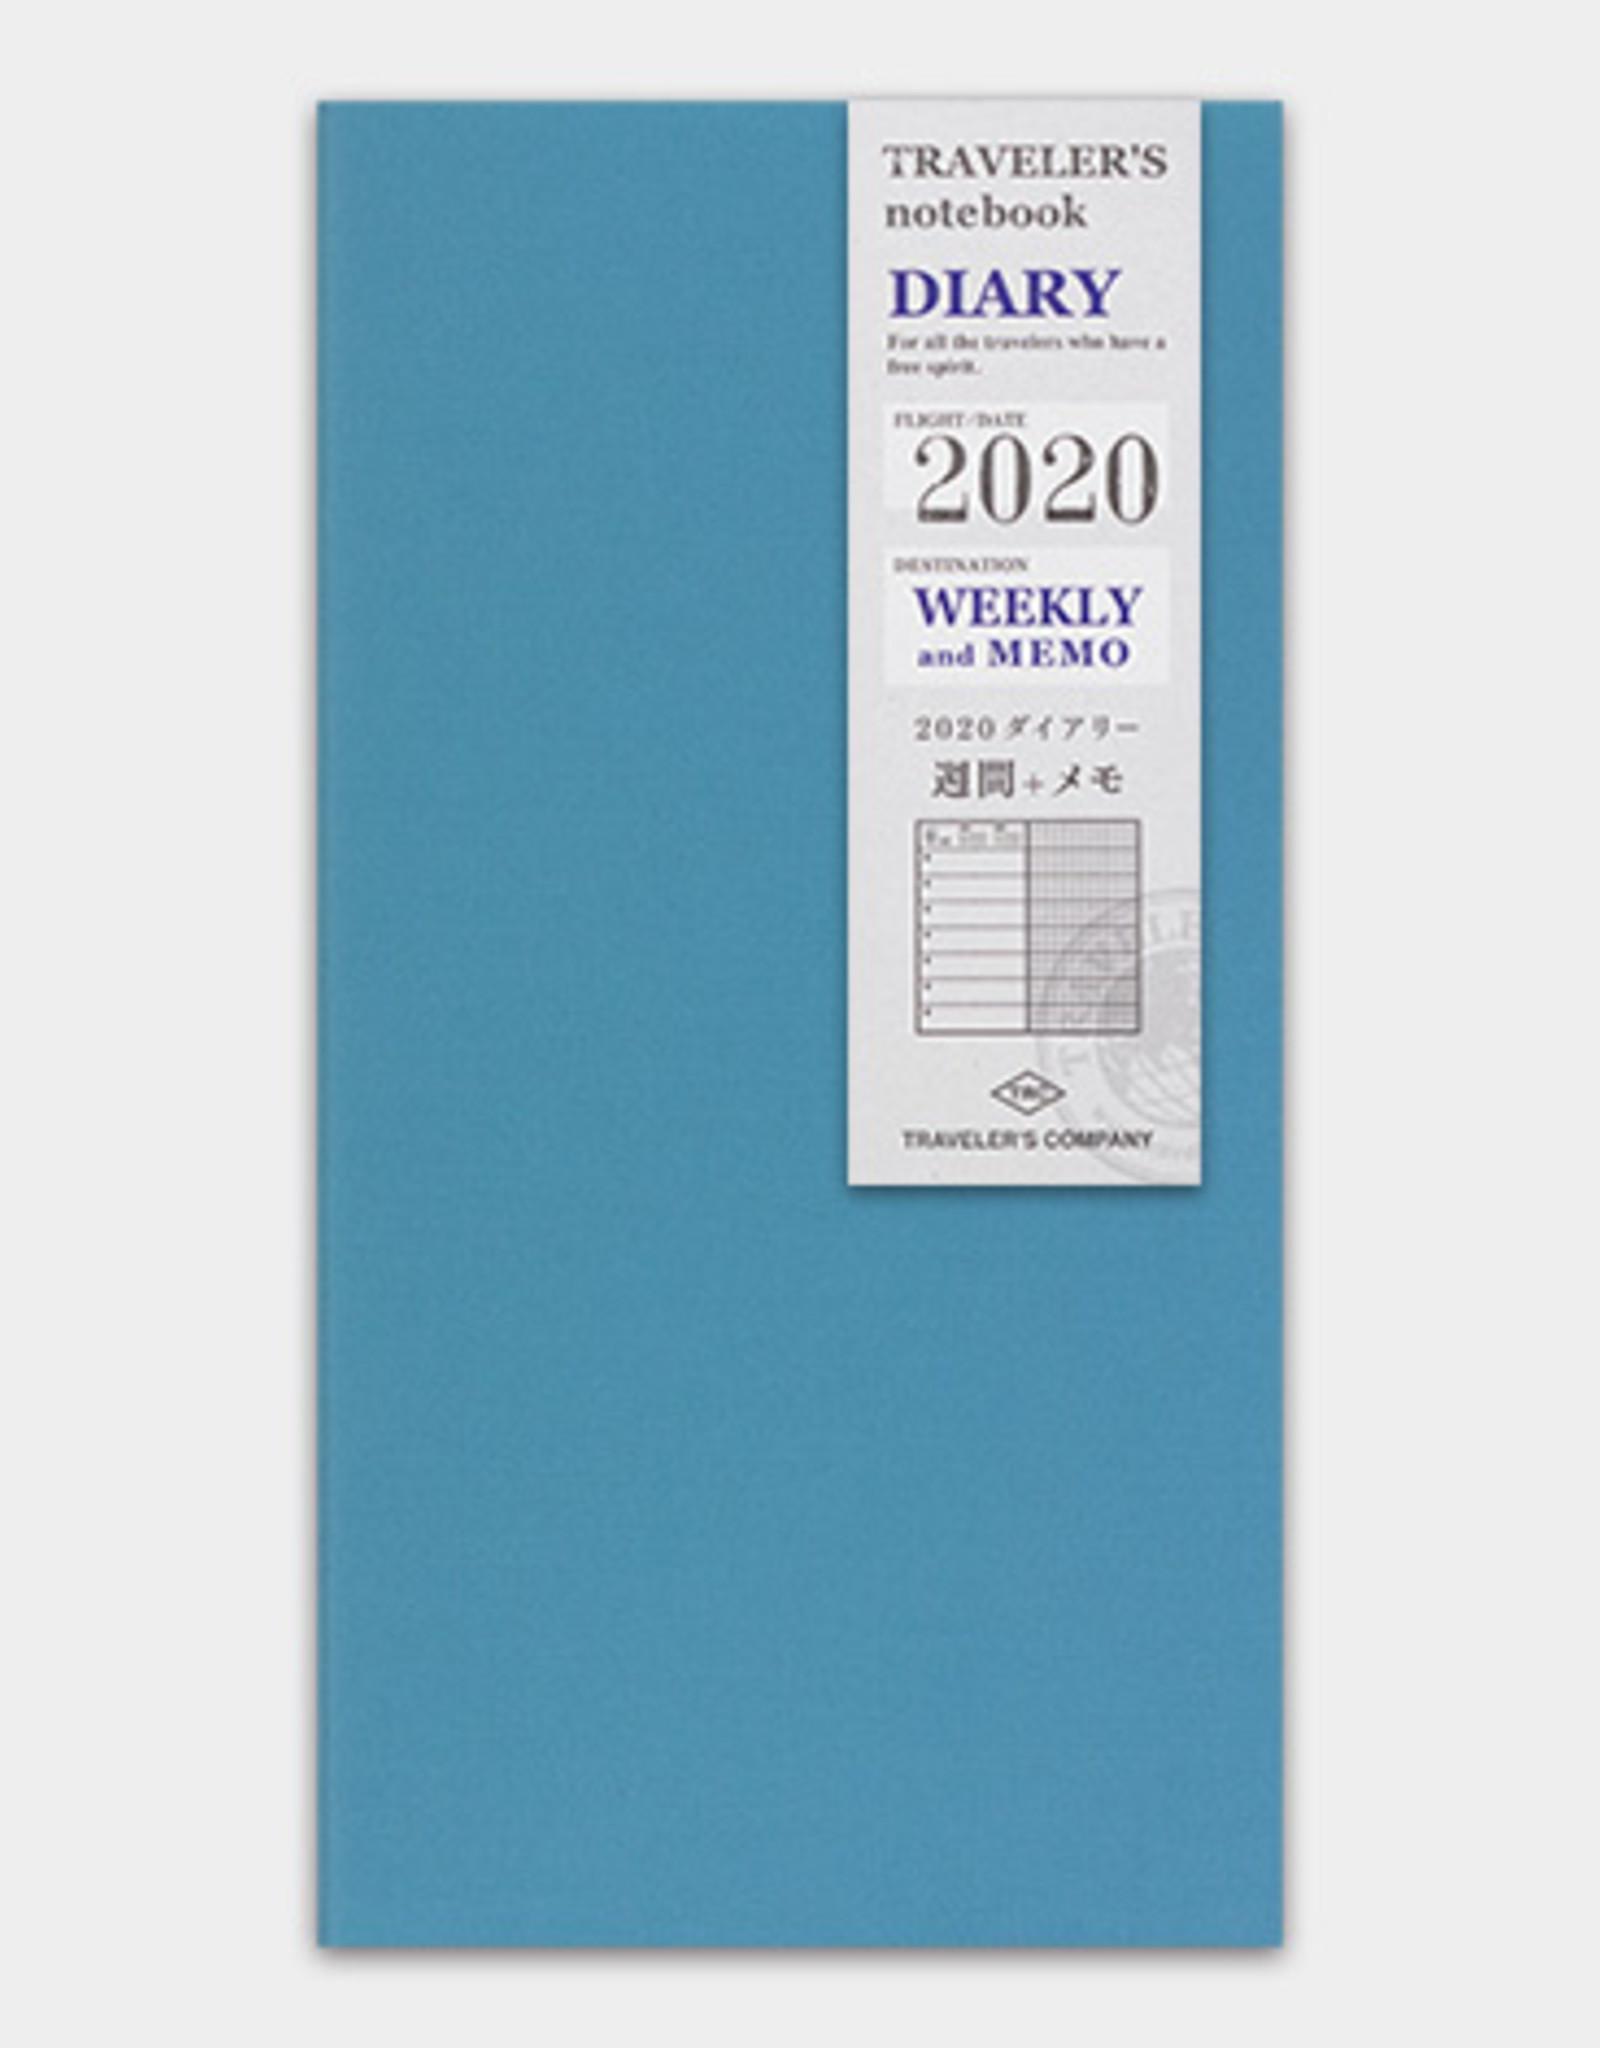 Traveler's Company Traveler's Company Notebook 2020 2nd Half